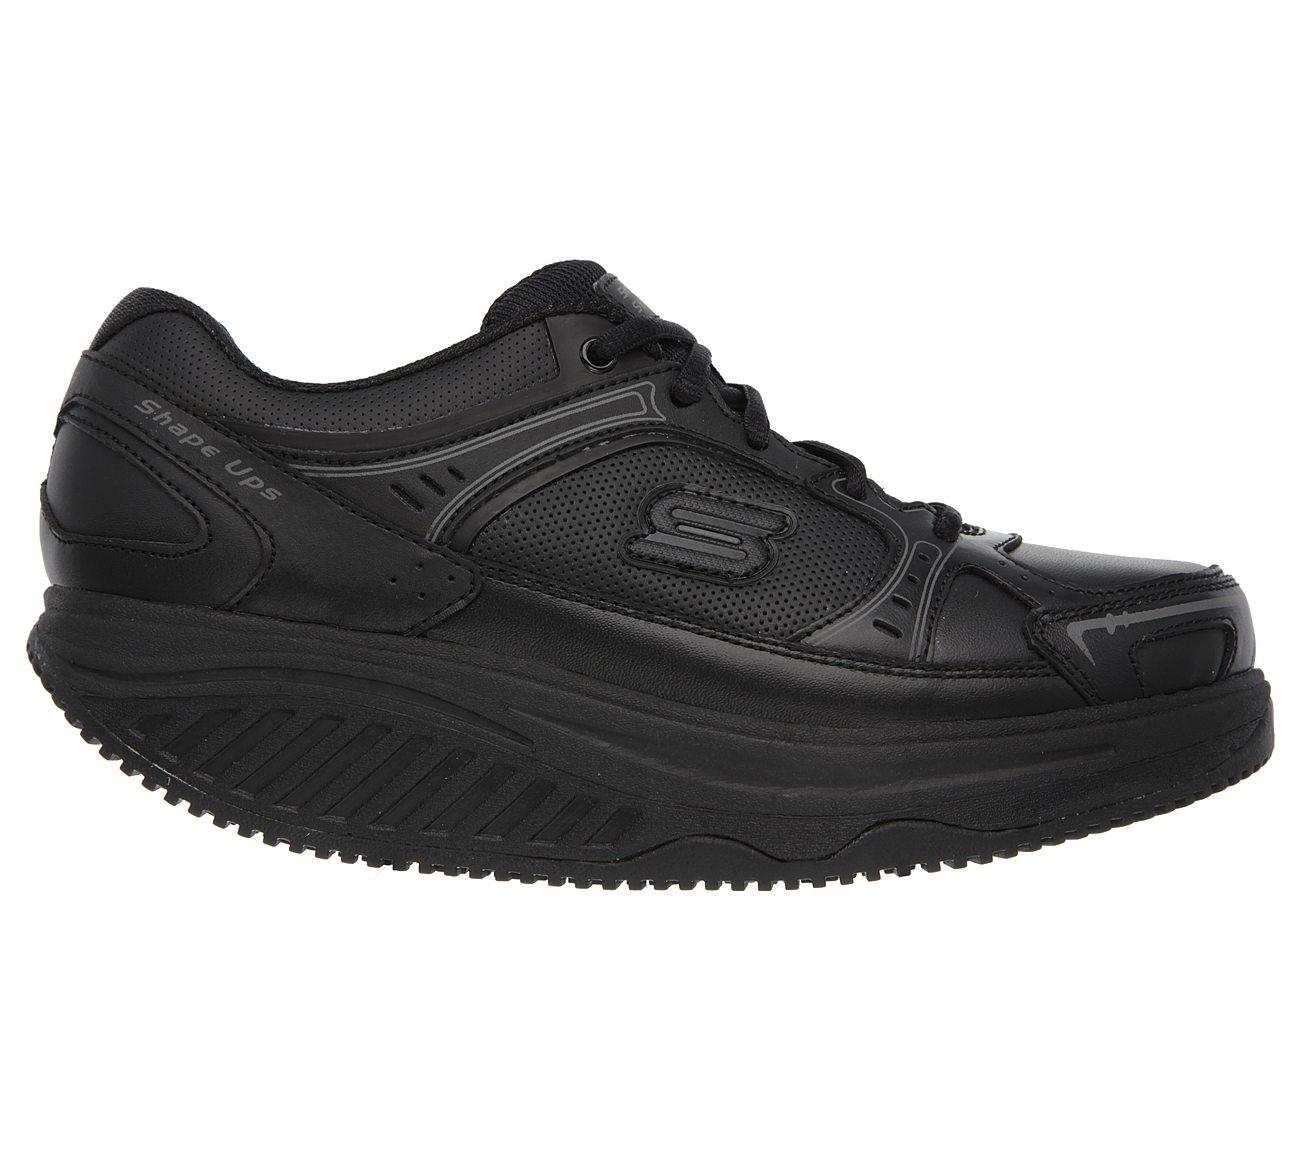 2aadd7c6830c1 Buy SKECHERS Work: Shape-ups - Maisto SR Shape-ups Shoes only $55.00